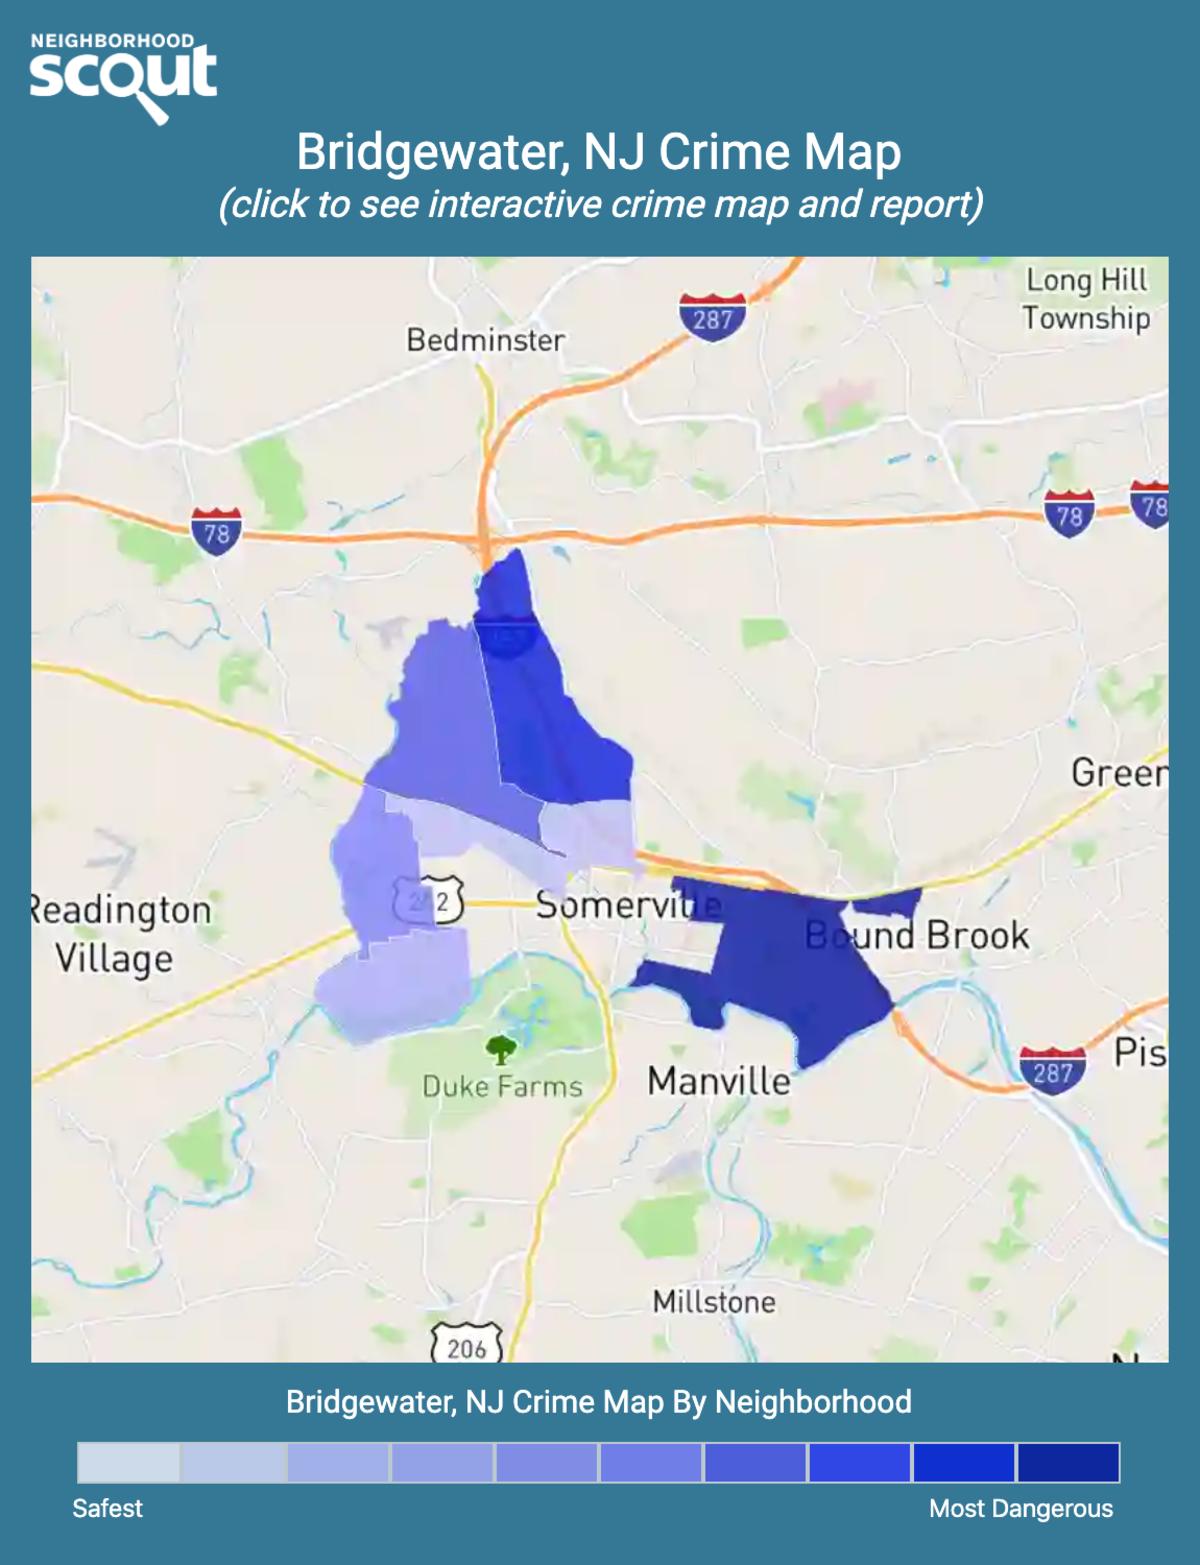 Bridgewater, New Jersey crime map